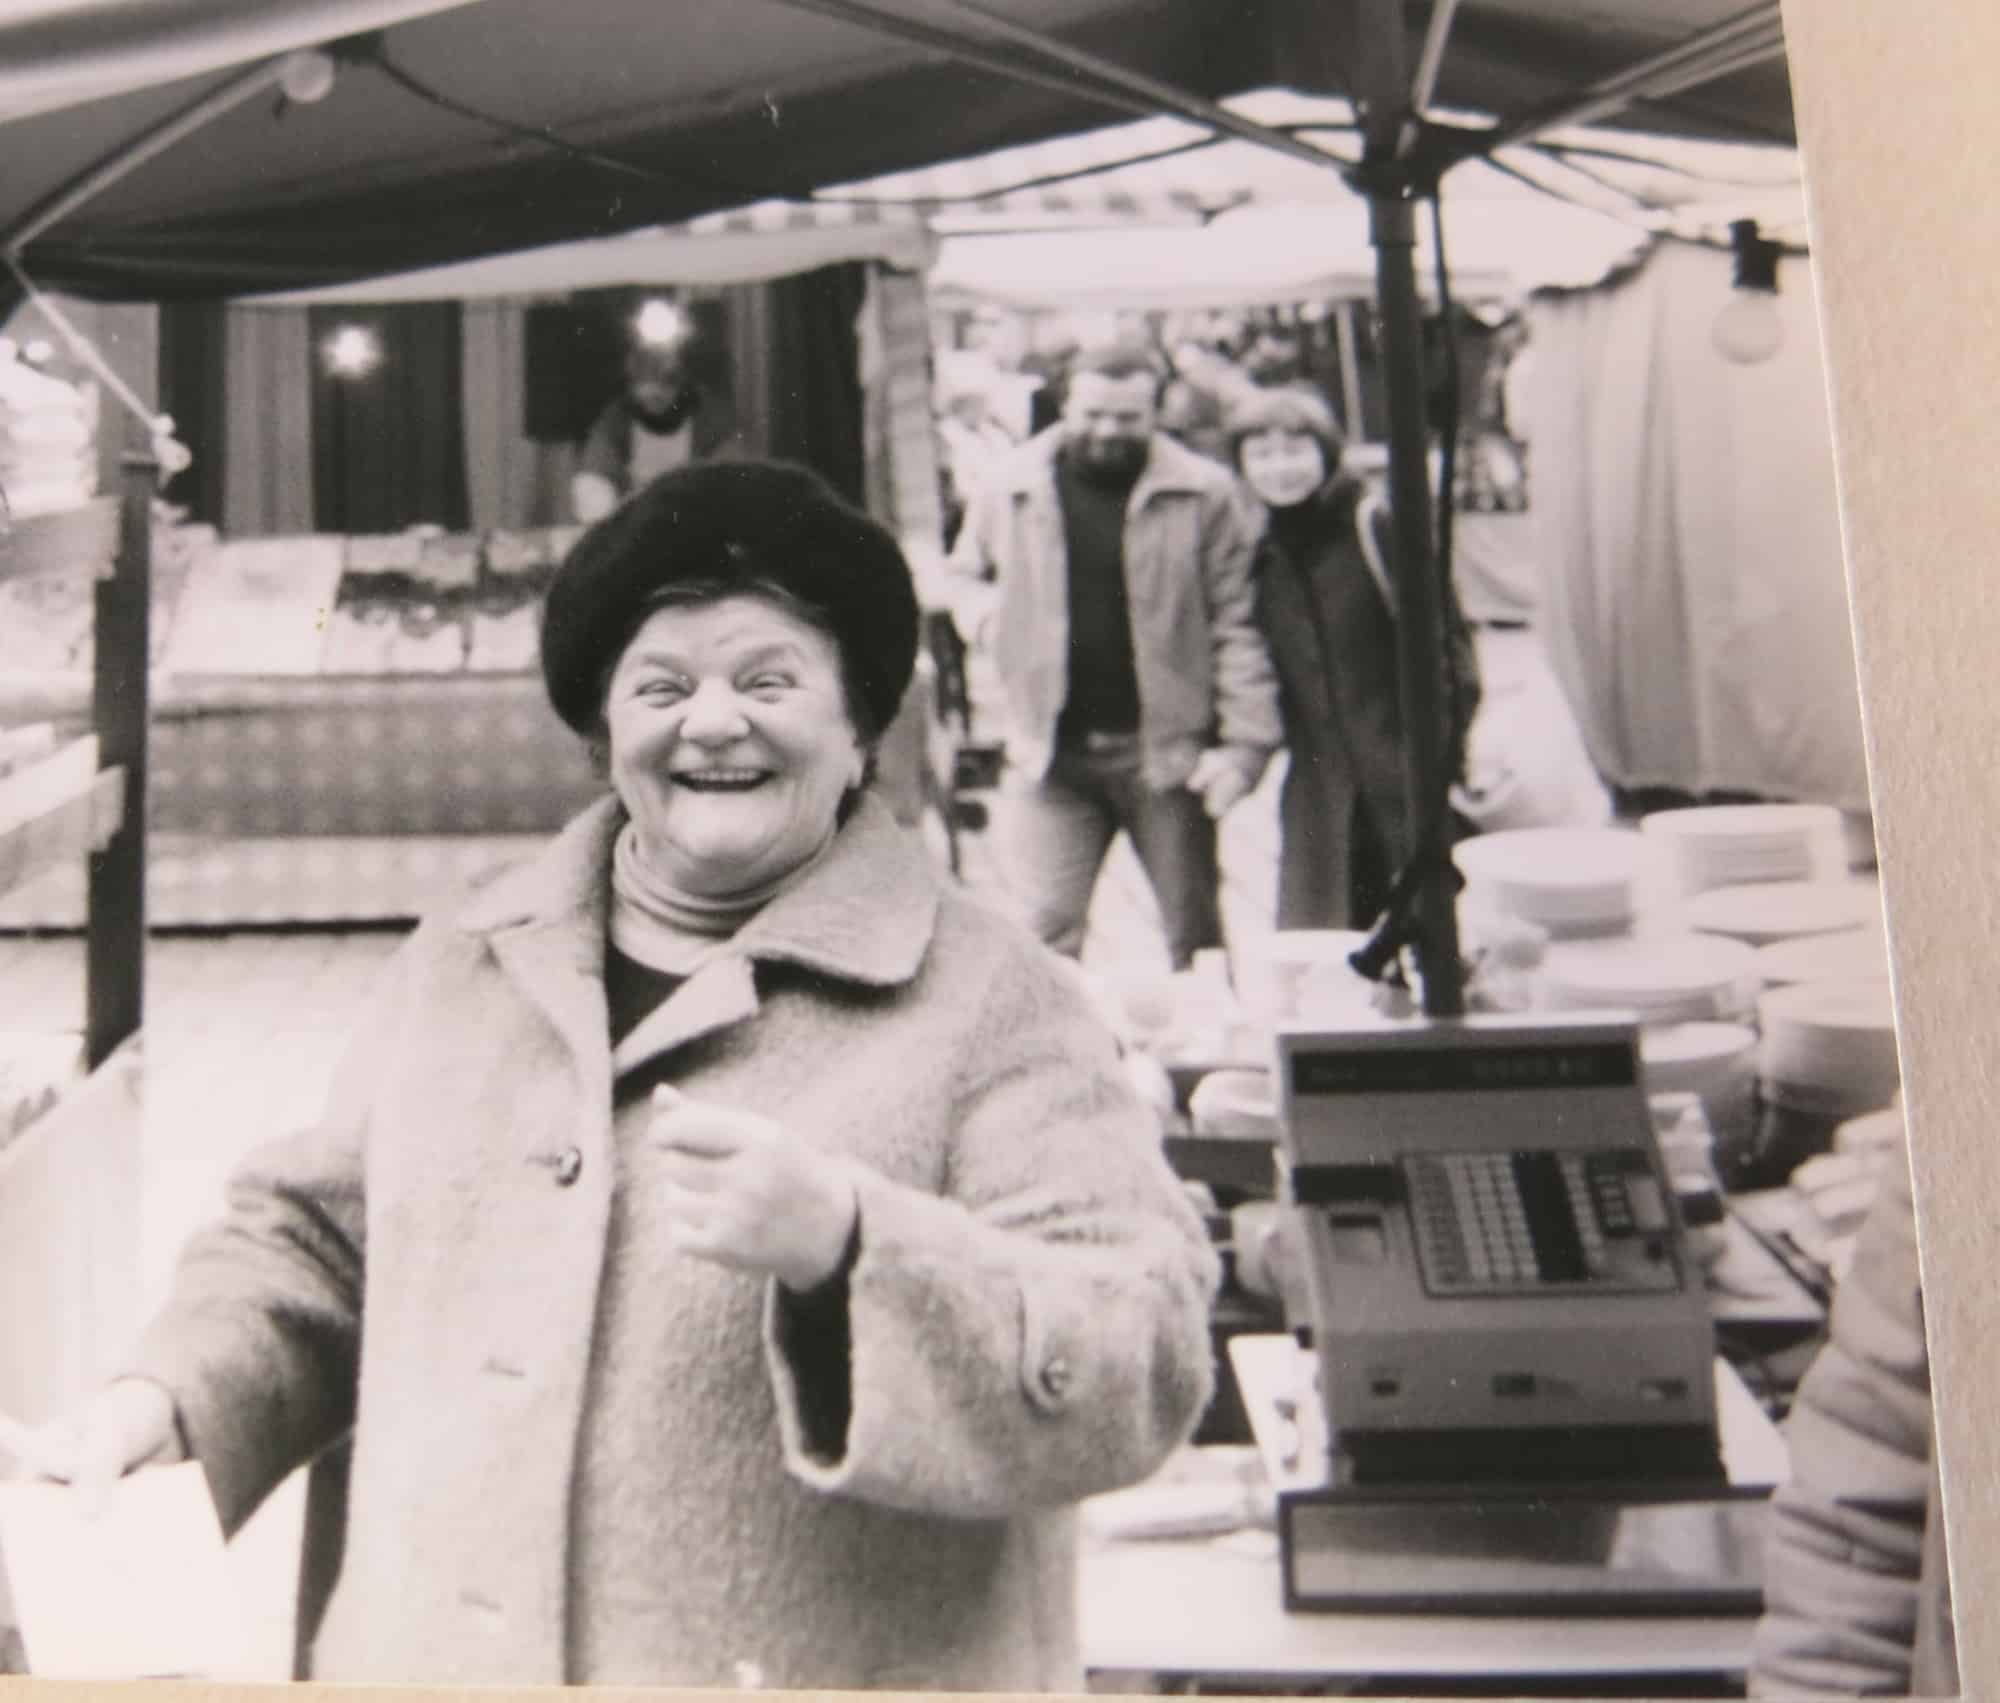 Katharina Kriener Hauptmarkt Nürnberg Porzellanstand circa 1975